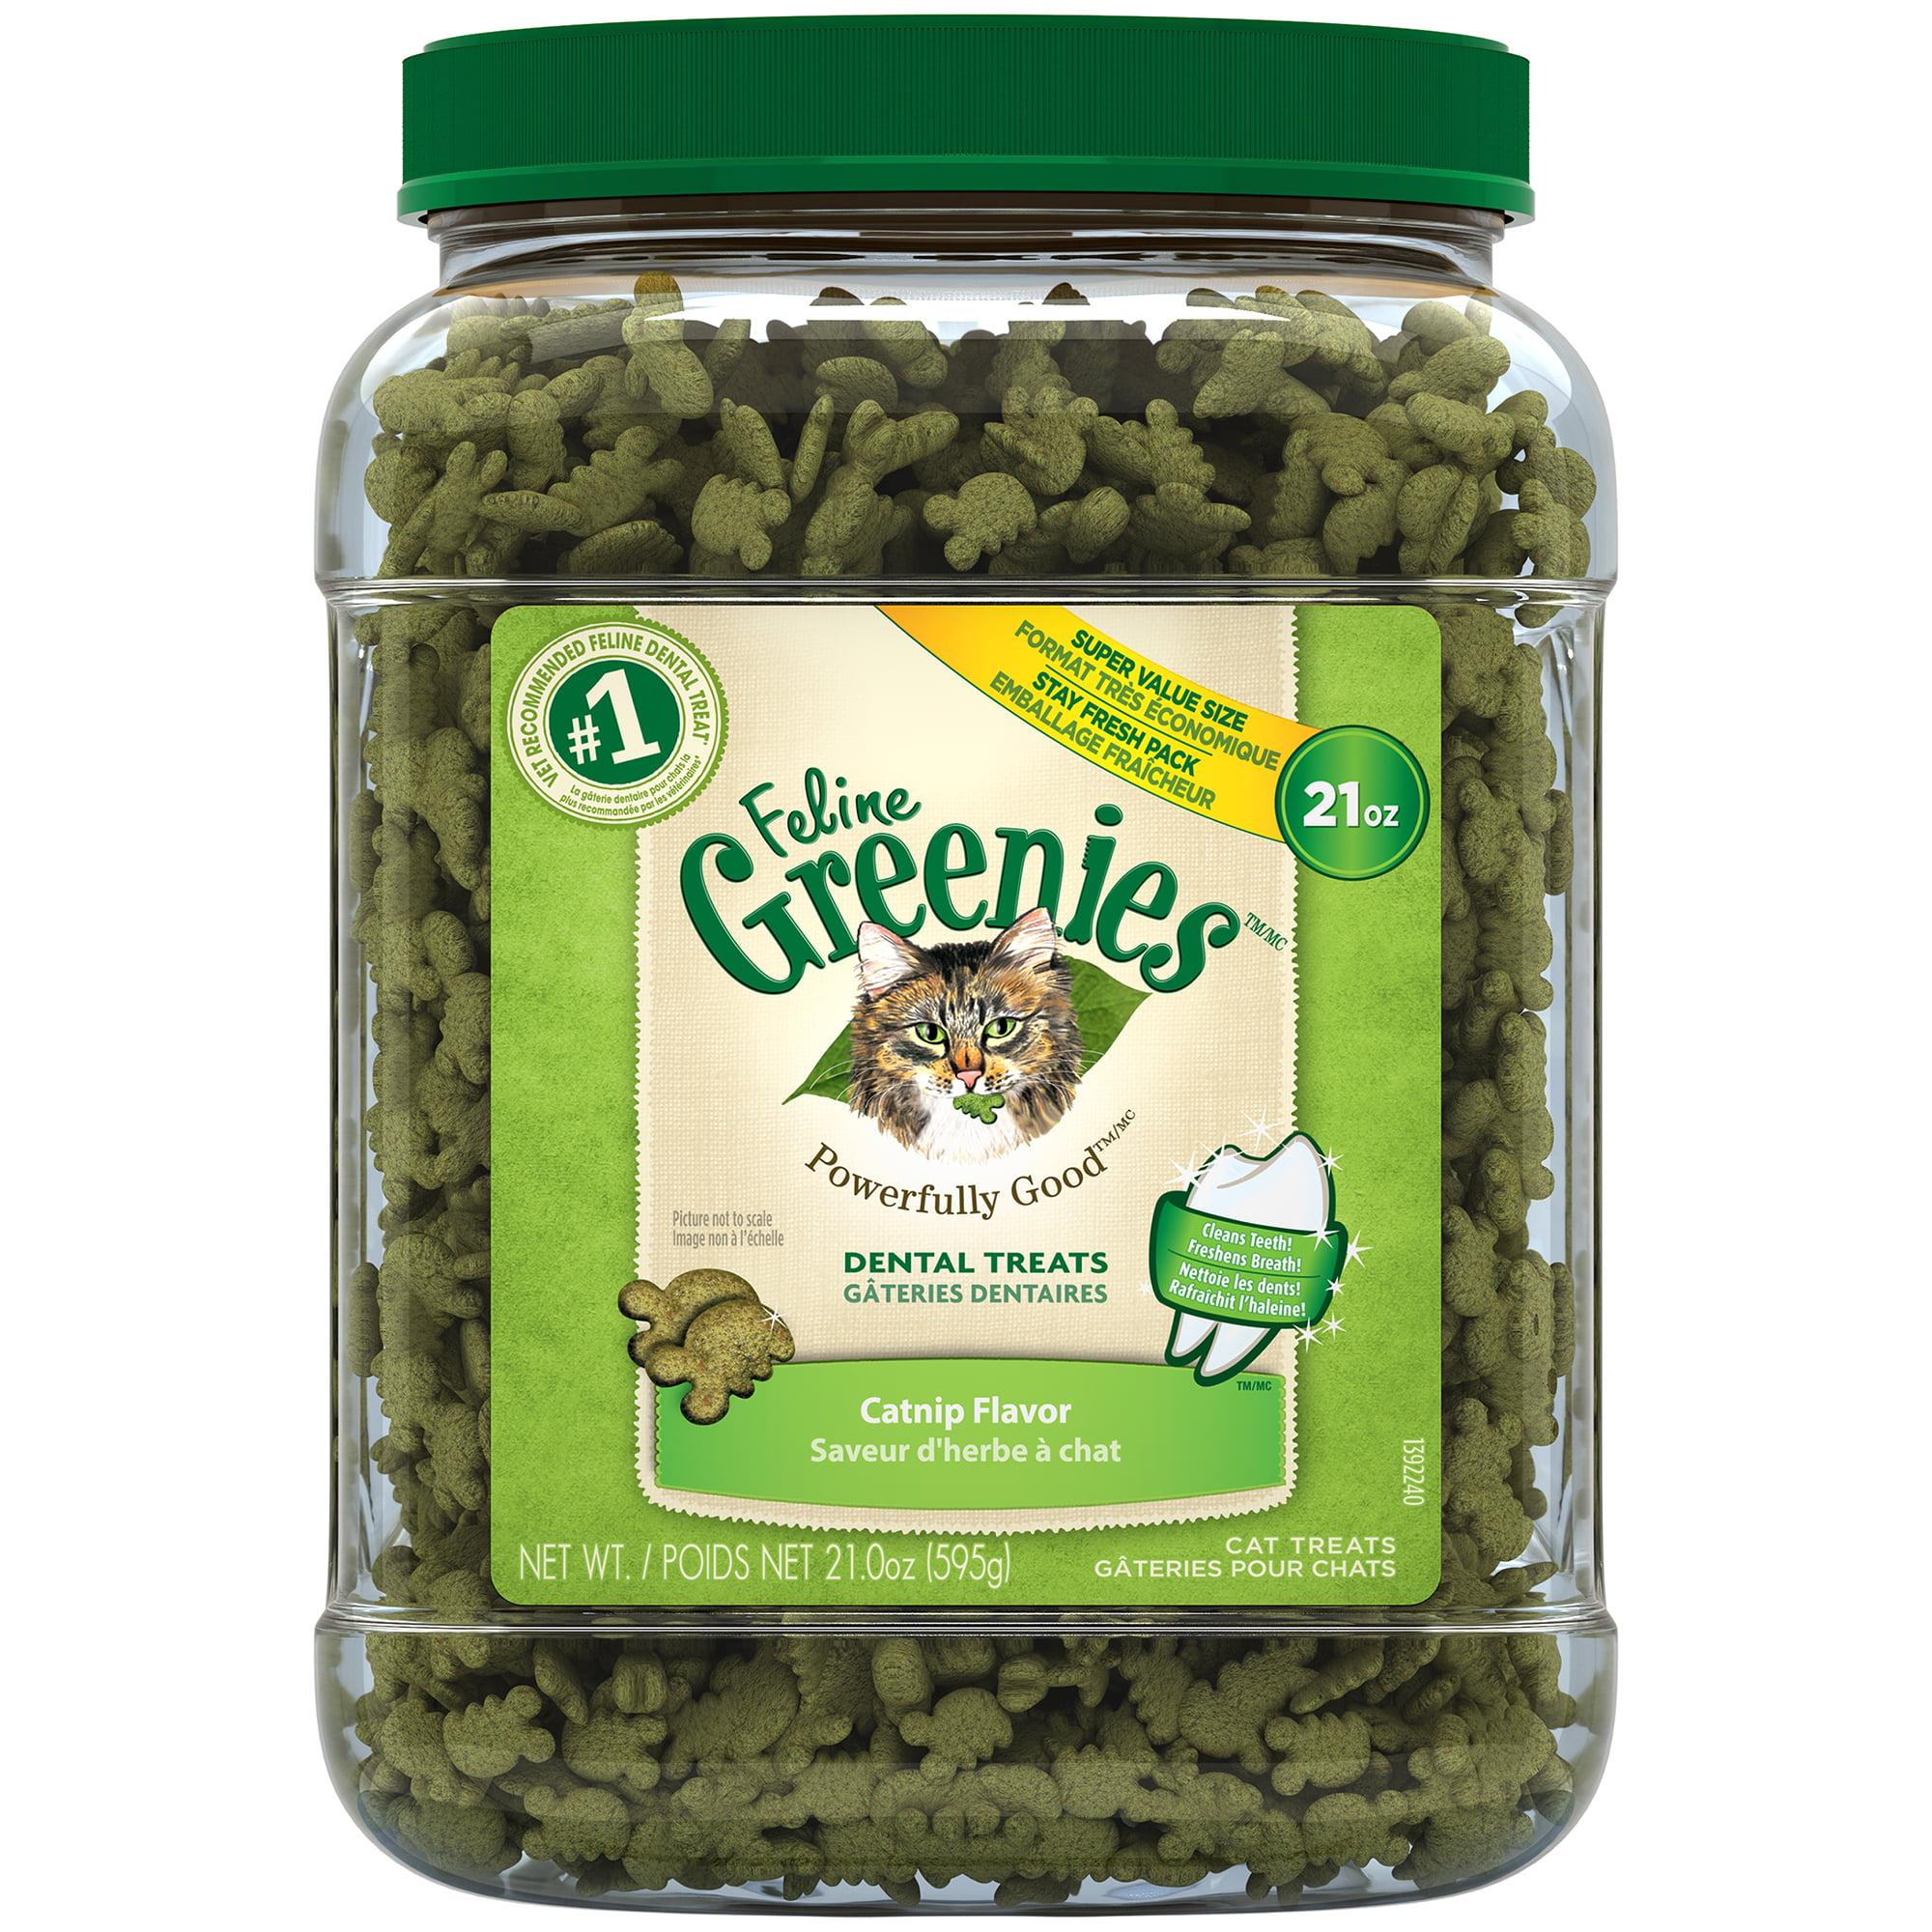 Greenies Feline Dental Cat Treats Catnip Flavor, 21 oz. Tub by Mars Petcare